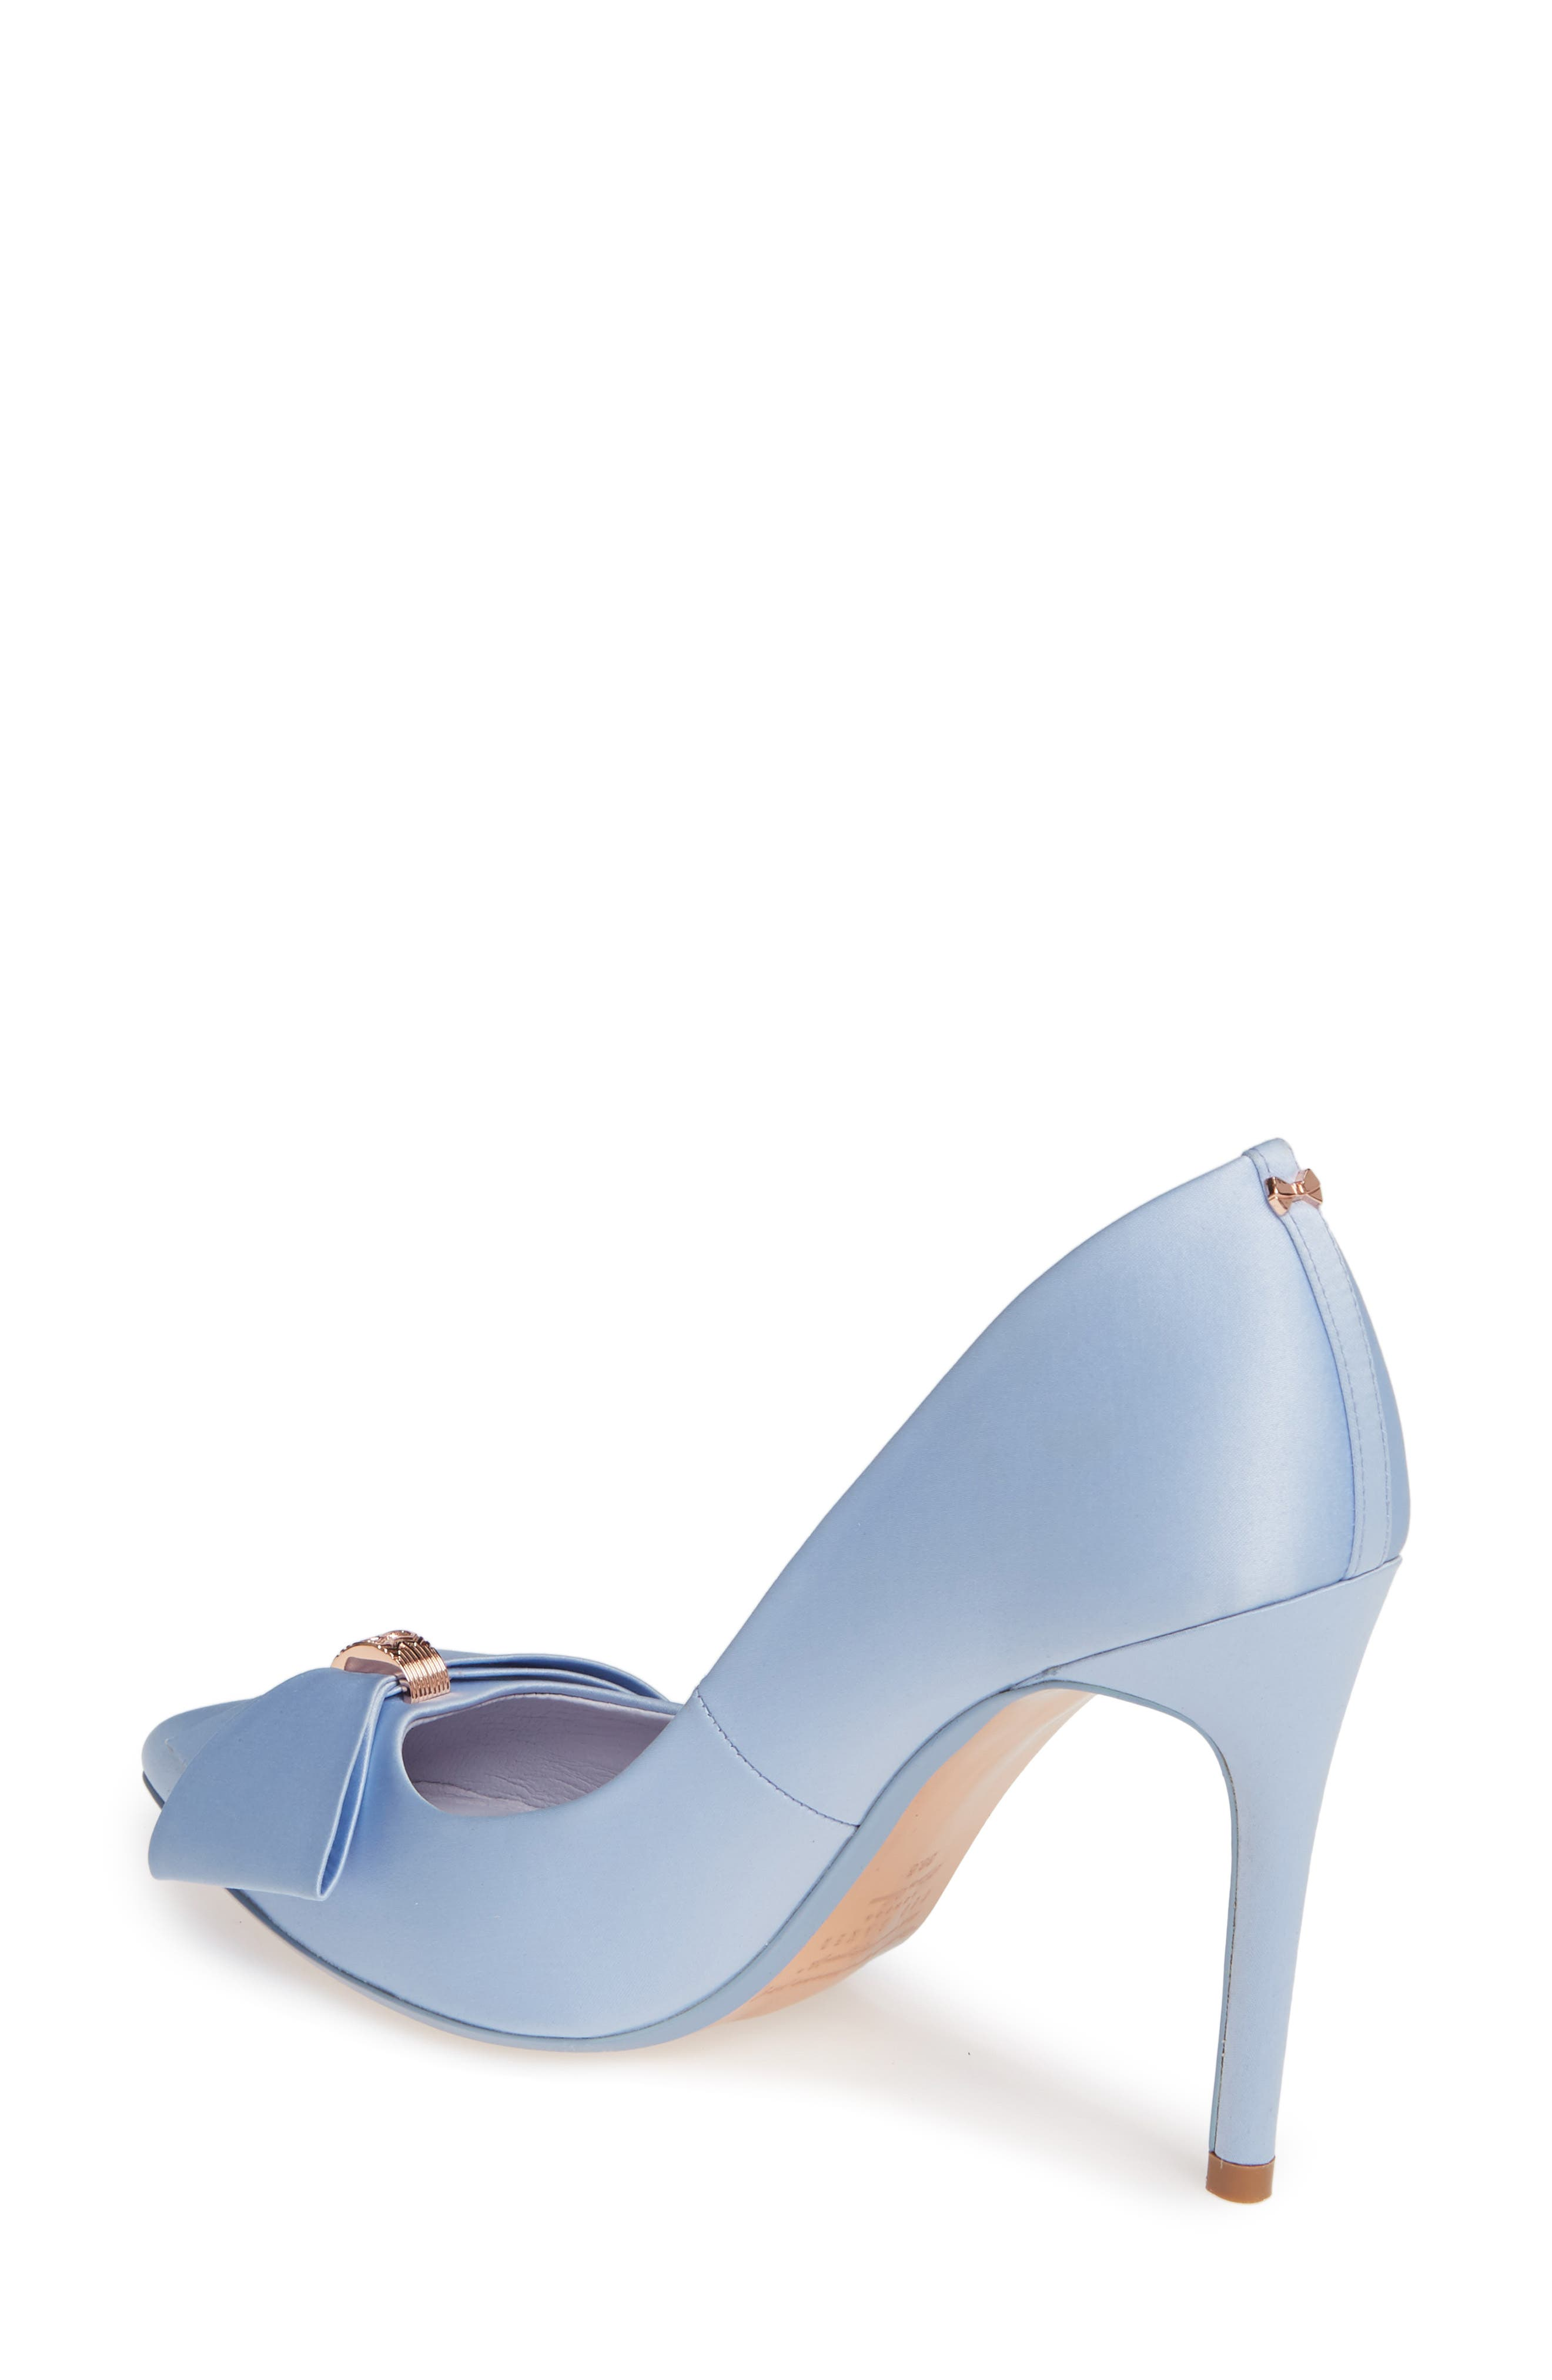 a68215cf24c849 Women s Ted Baker London Wedding Shoes